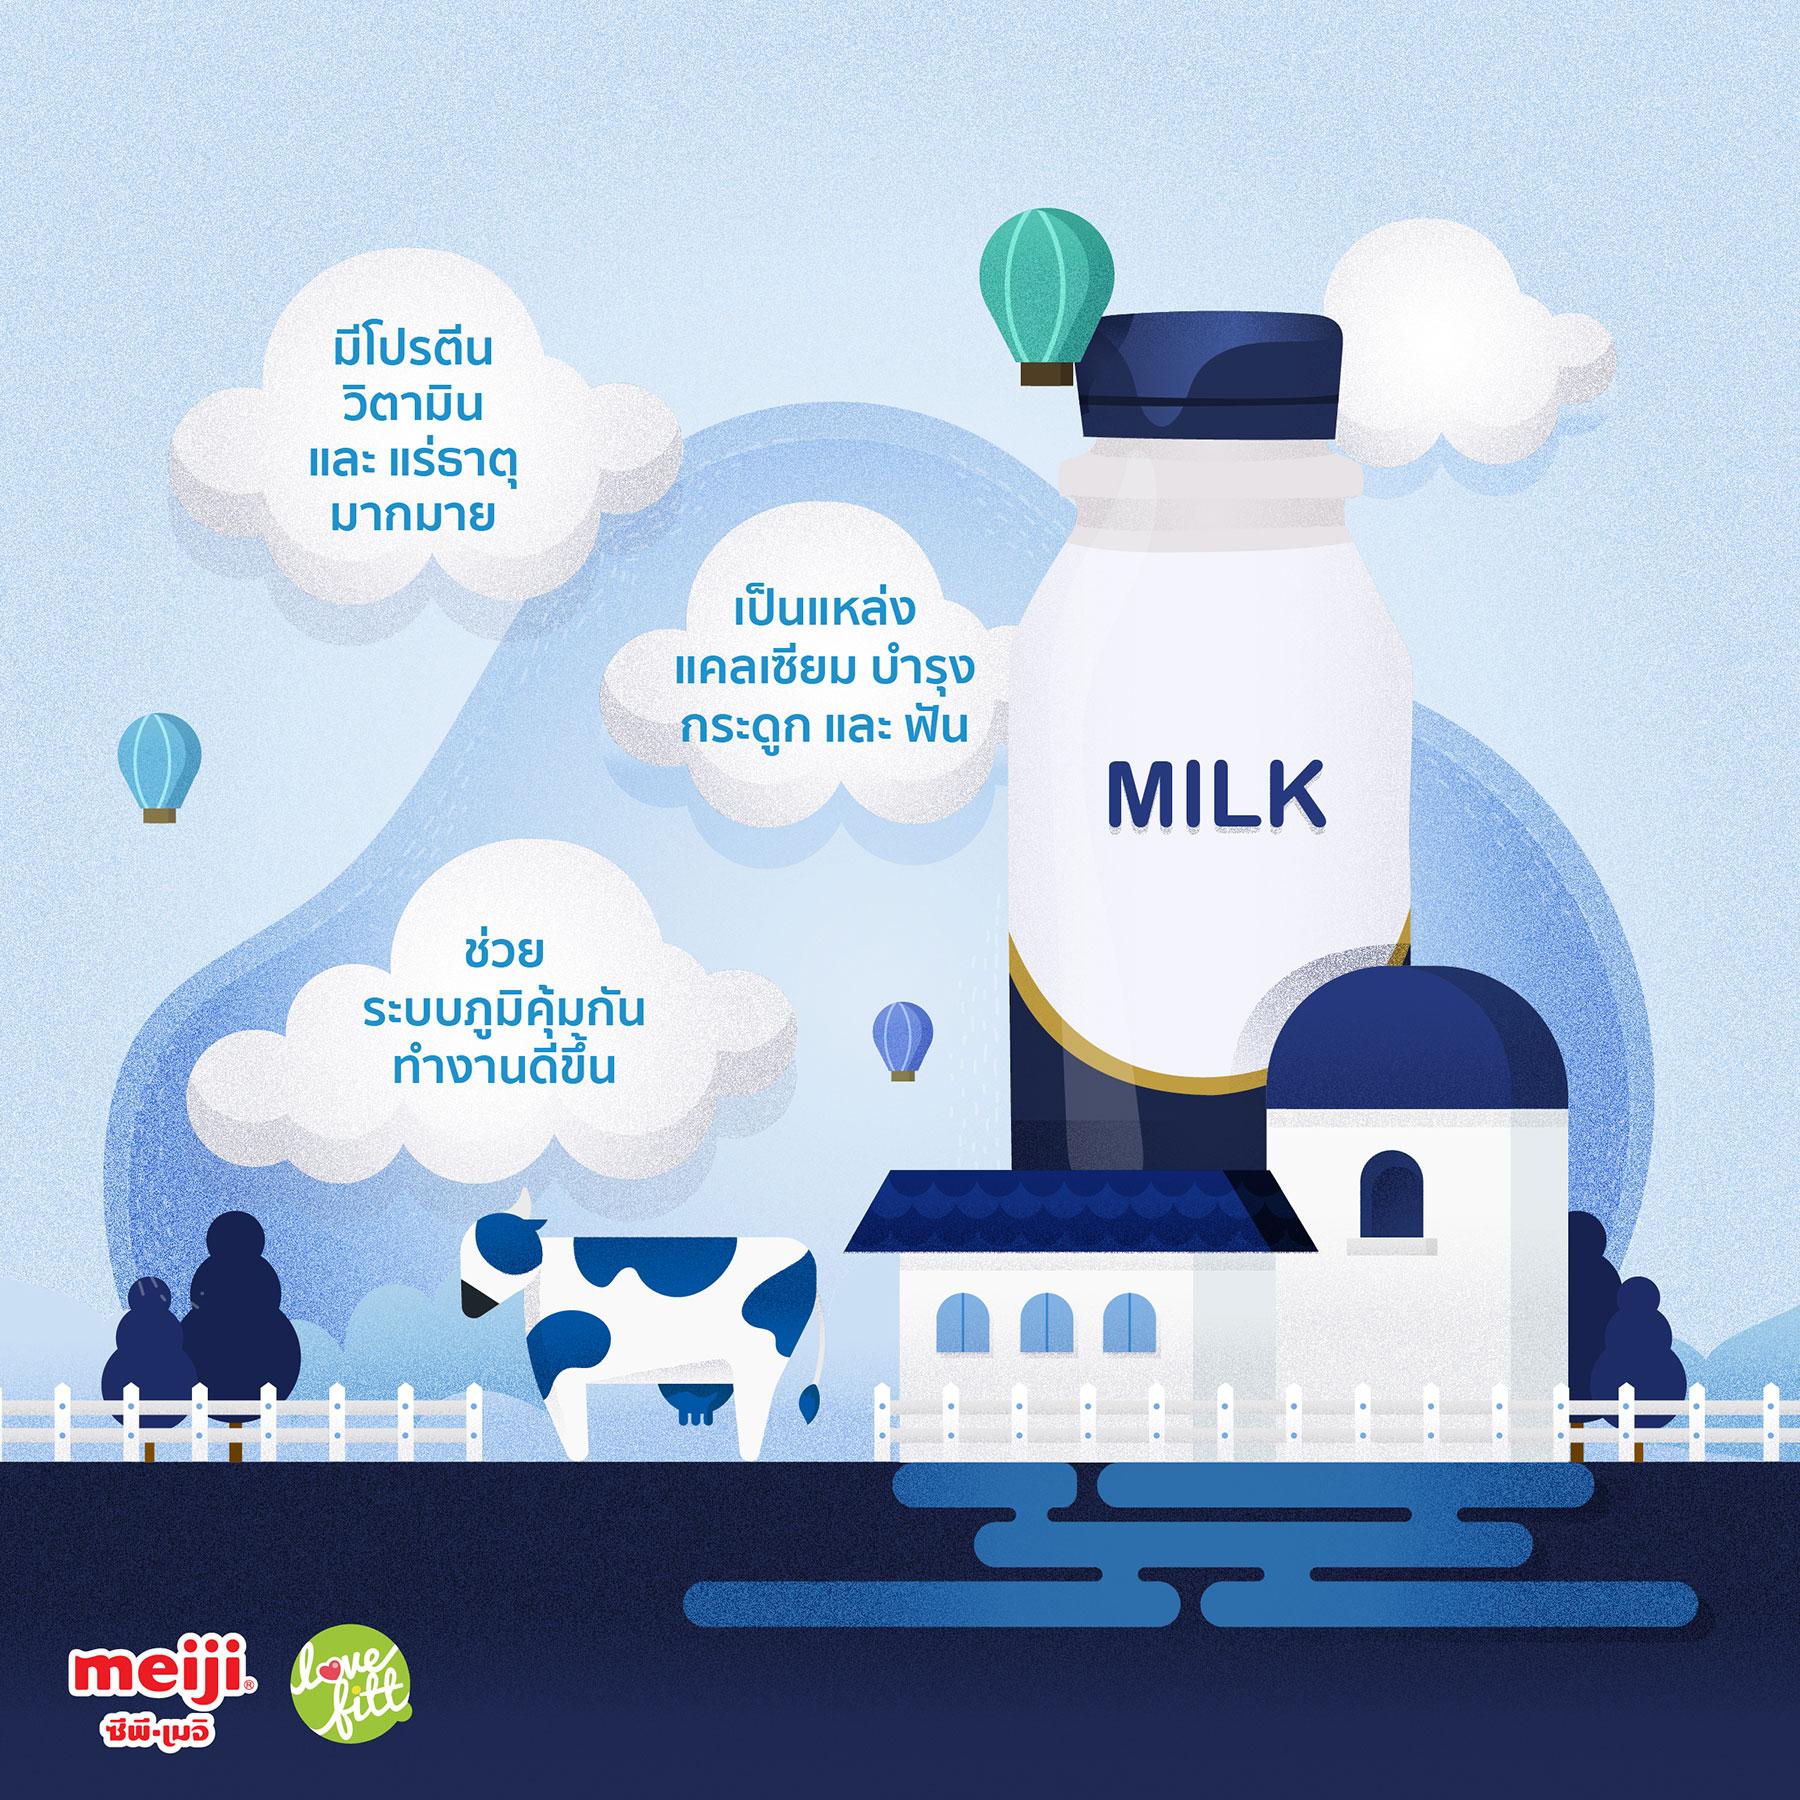 meiji-lactose-free-milk-img-01